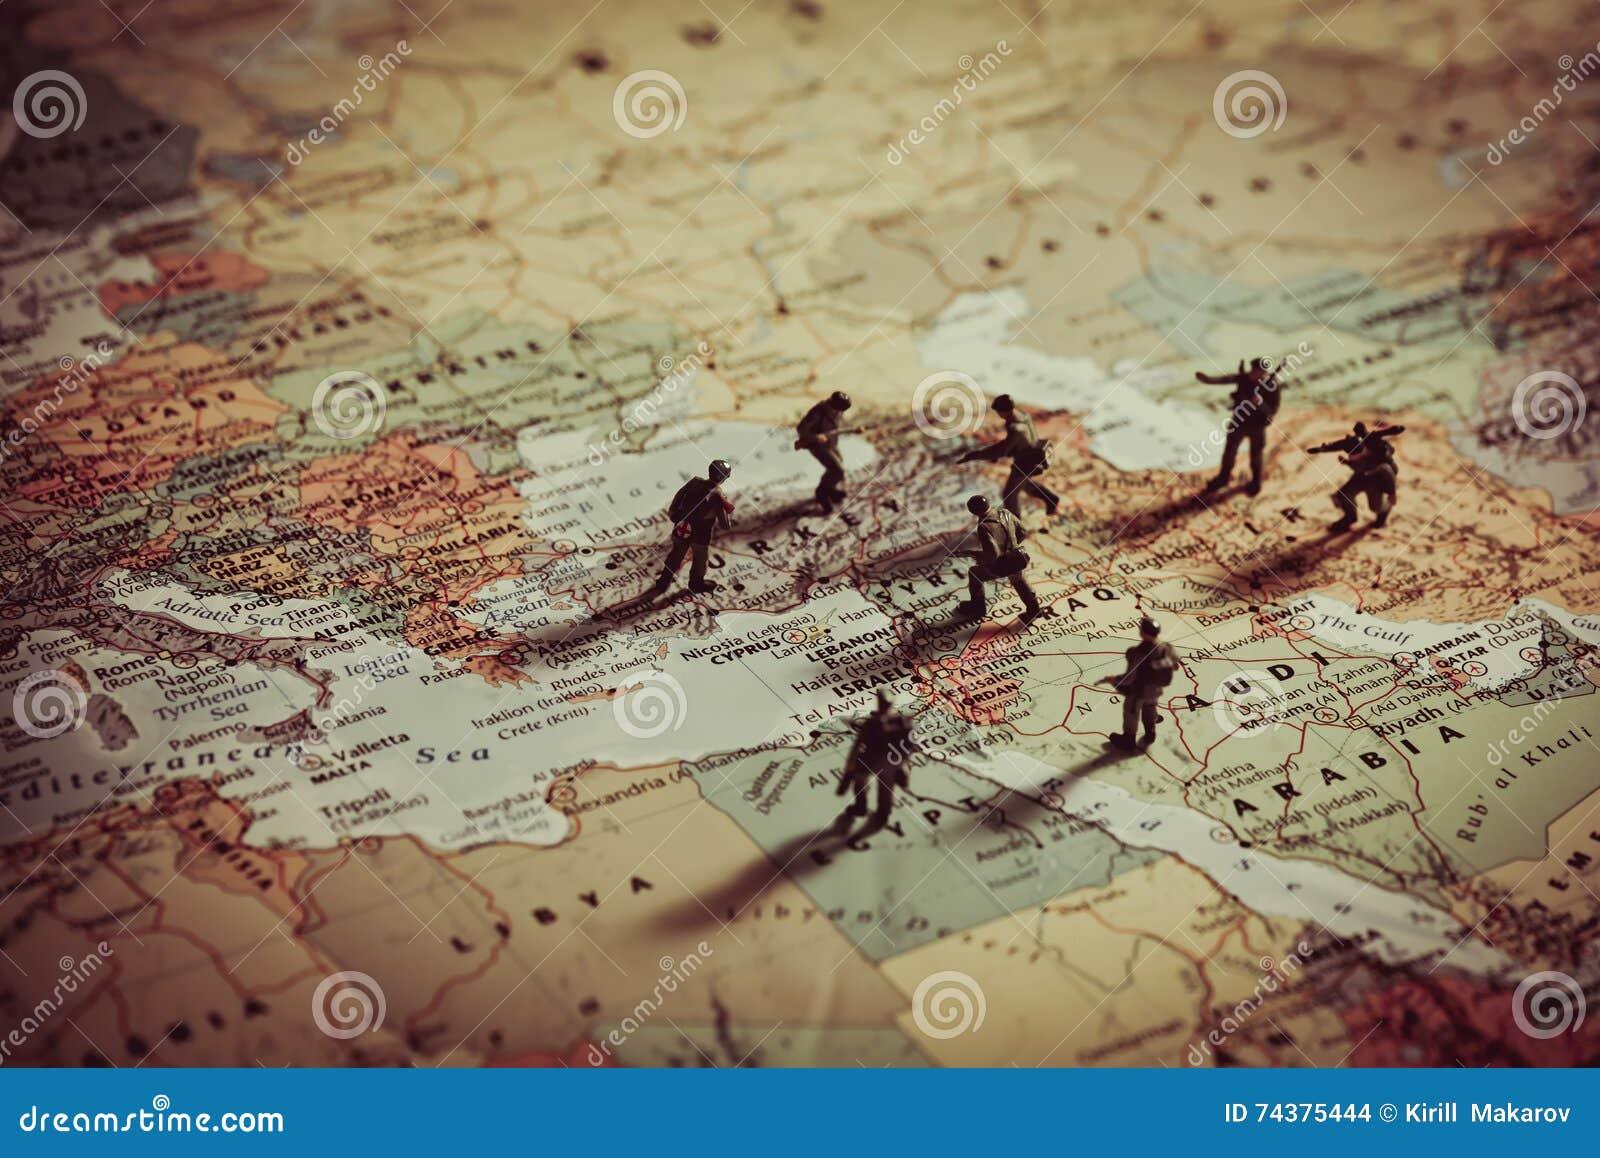 Concepto de agresión militar en Oriente Medio